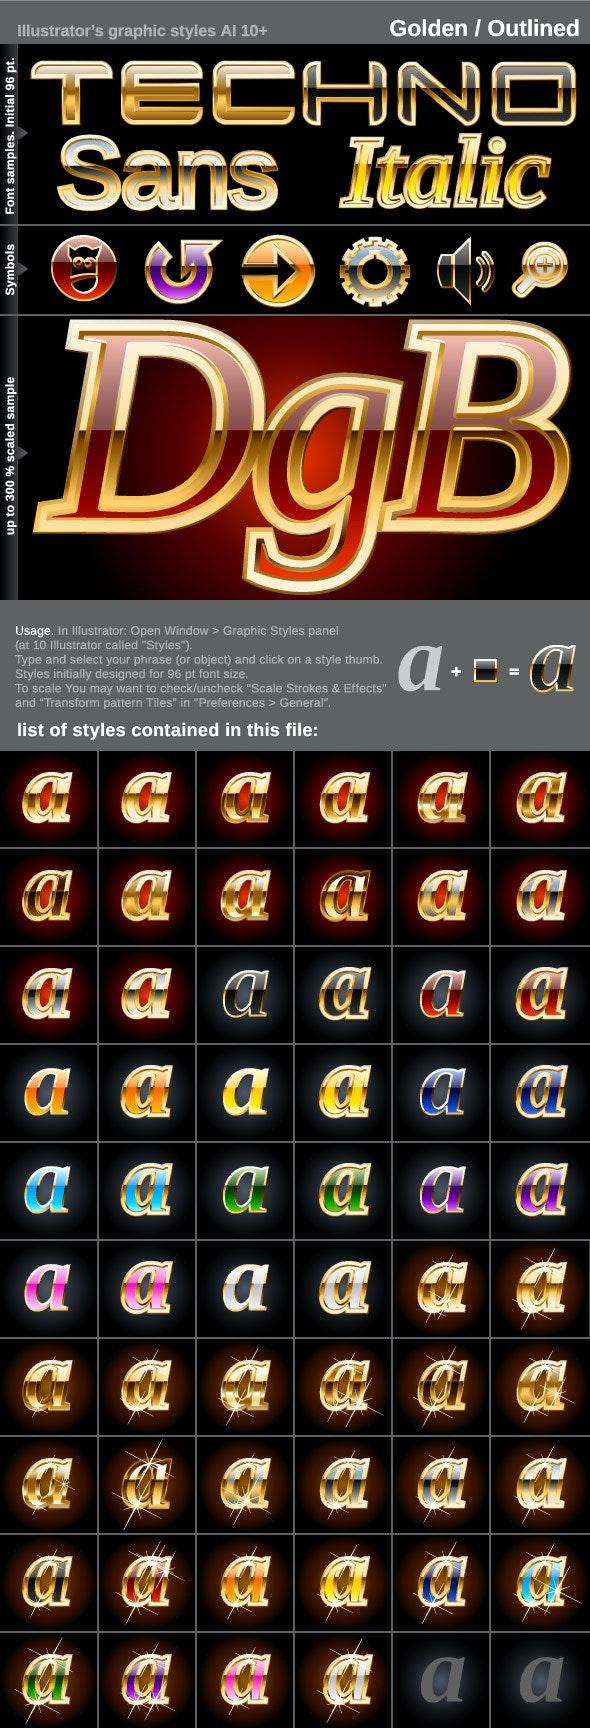 60 Illustrator Graphic Styles - Golden Outlined - Styles Illustrator